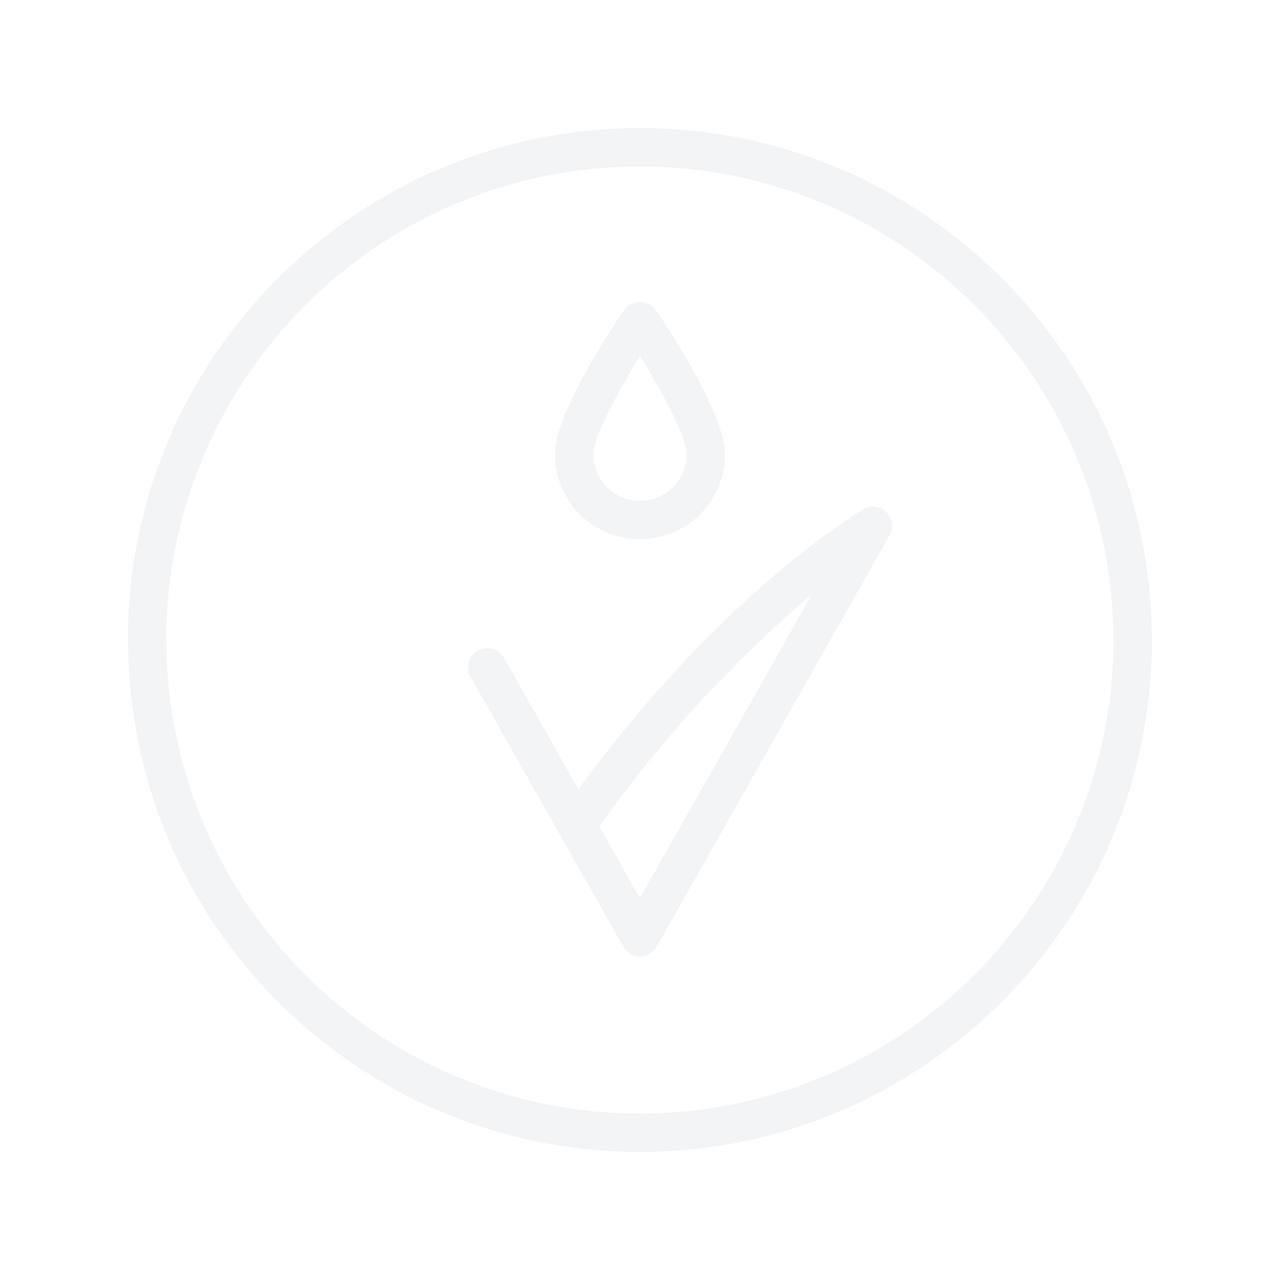 BOURJOIS LIner Feutre Slim Eyeliner No.16 Noir 0.8ml